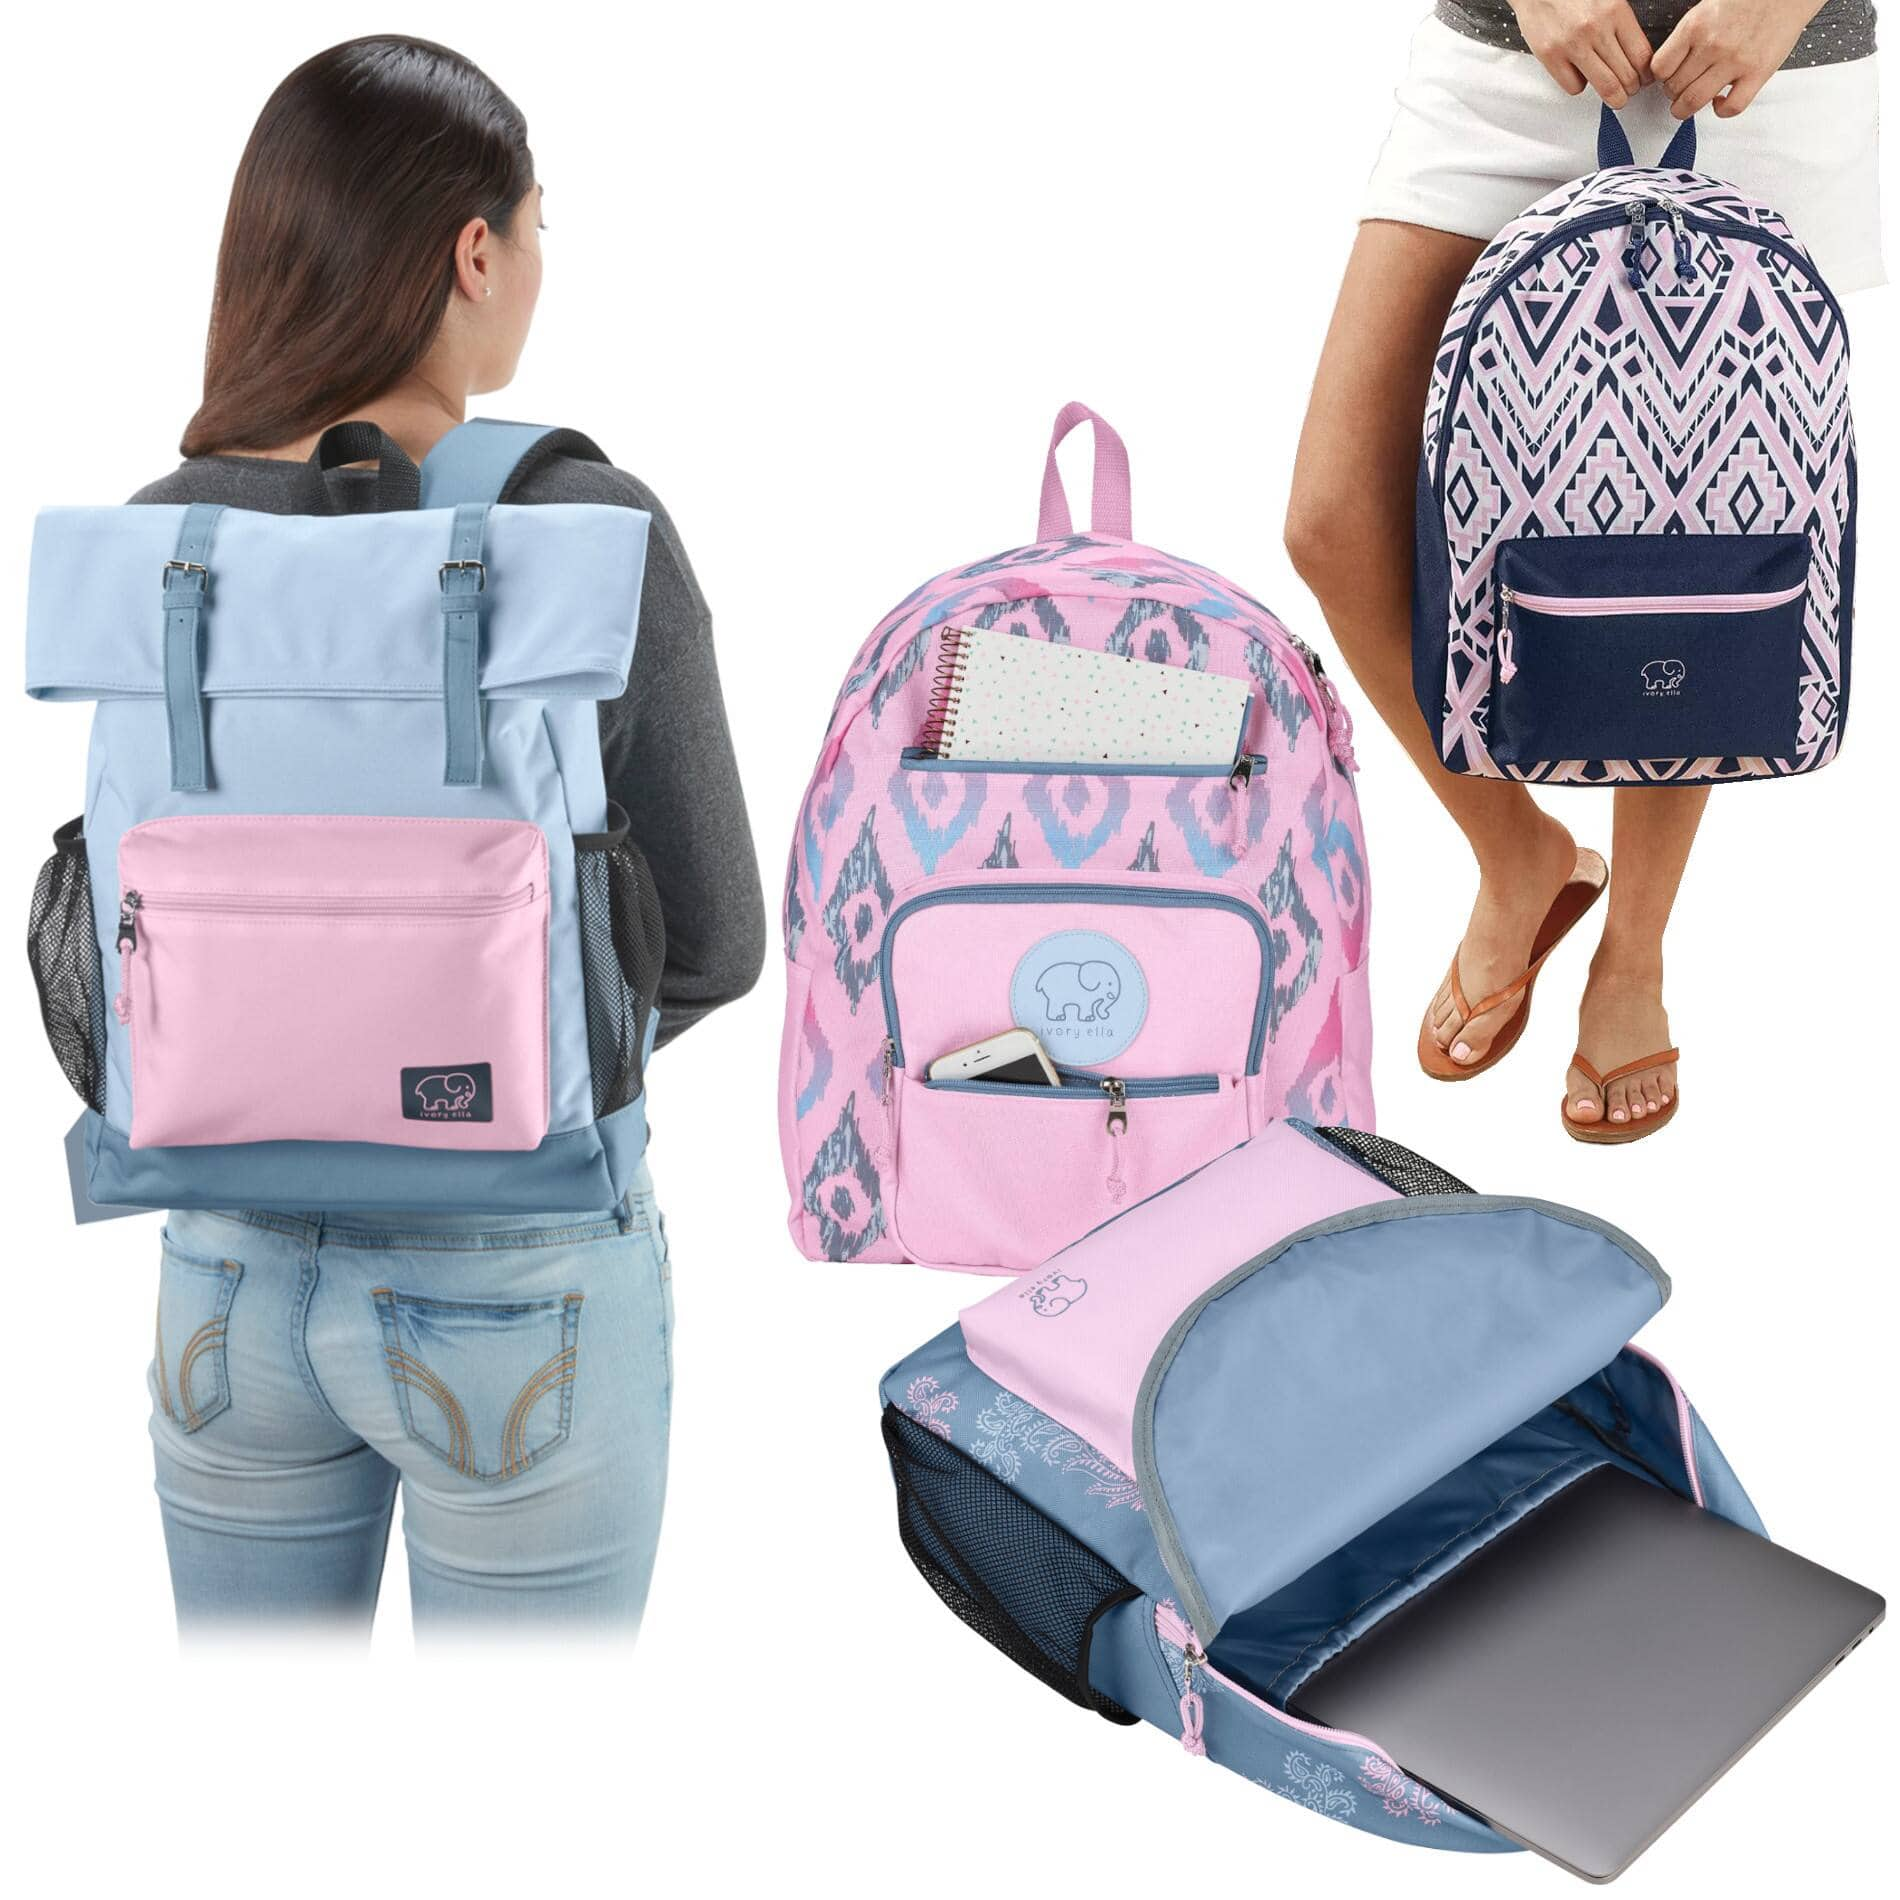 2-Pack: Conair by Ivory Ella Laptop Backpacks - $15 Shipped ($7.50/ea)